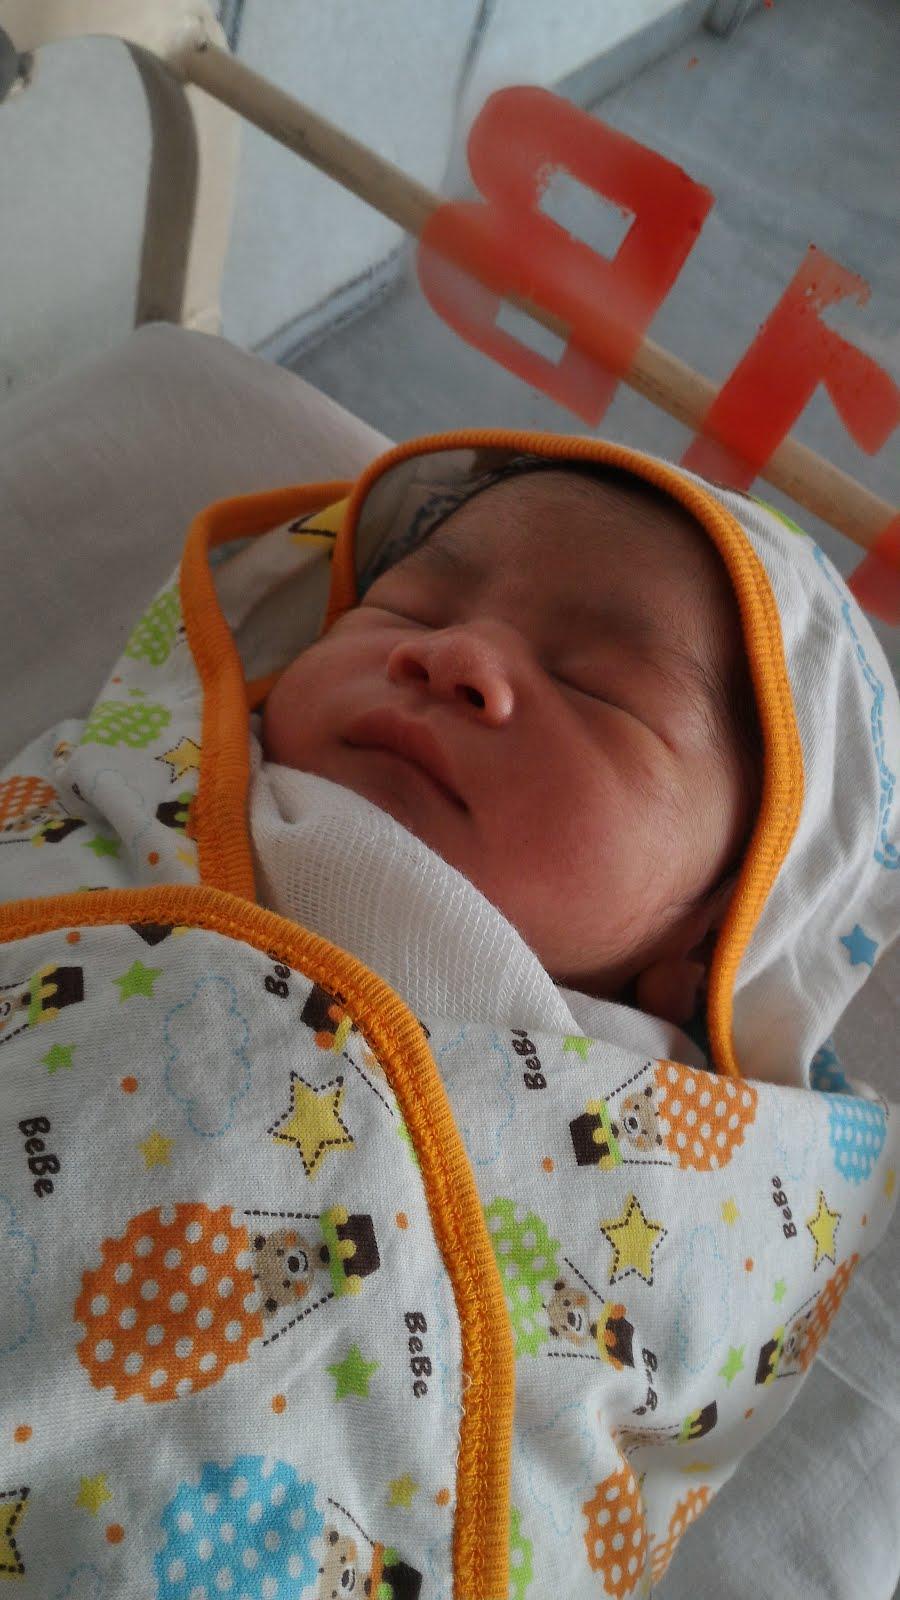 Muhammad Aqeel Fahimy